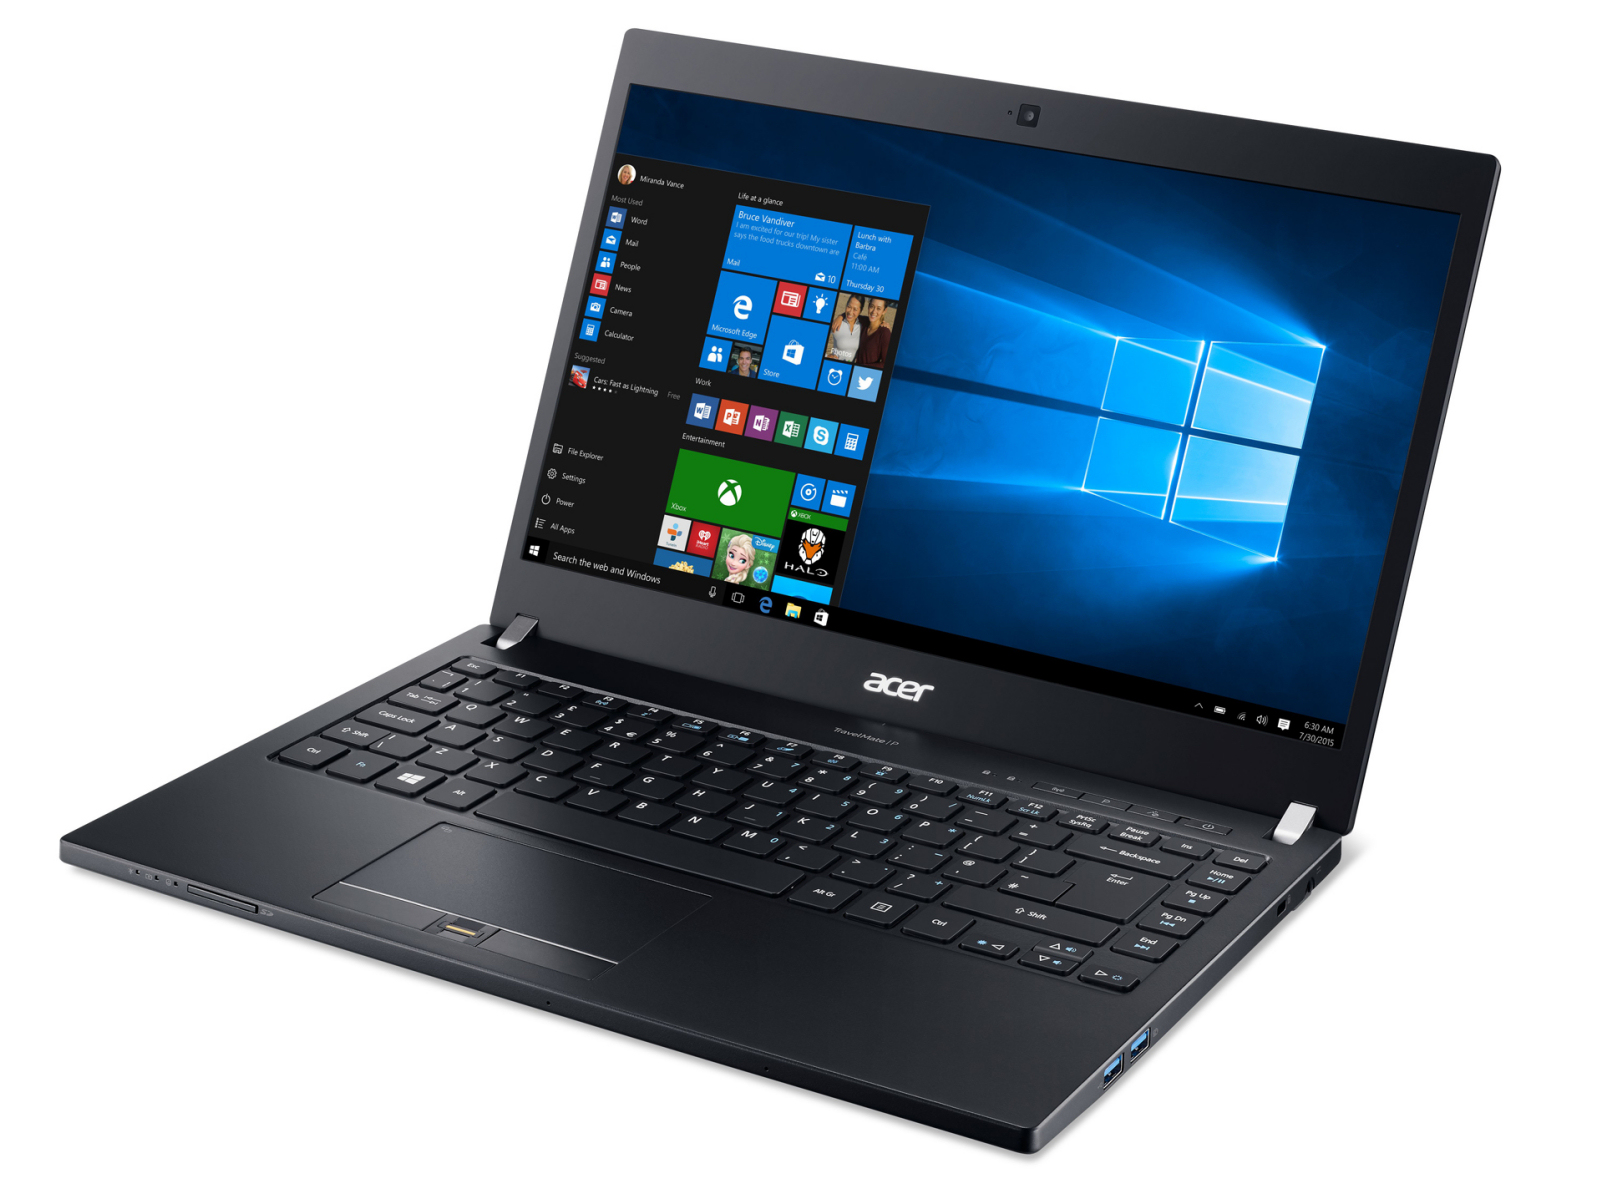 Acer TravelMate P653-M Intel Graphics Last